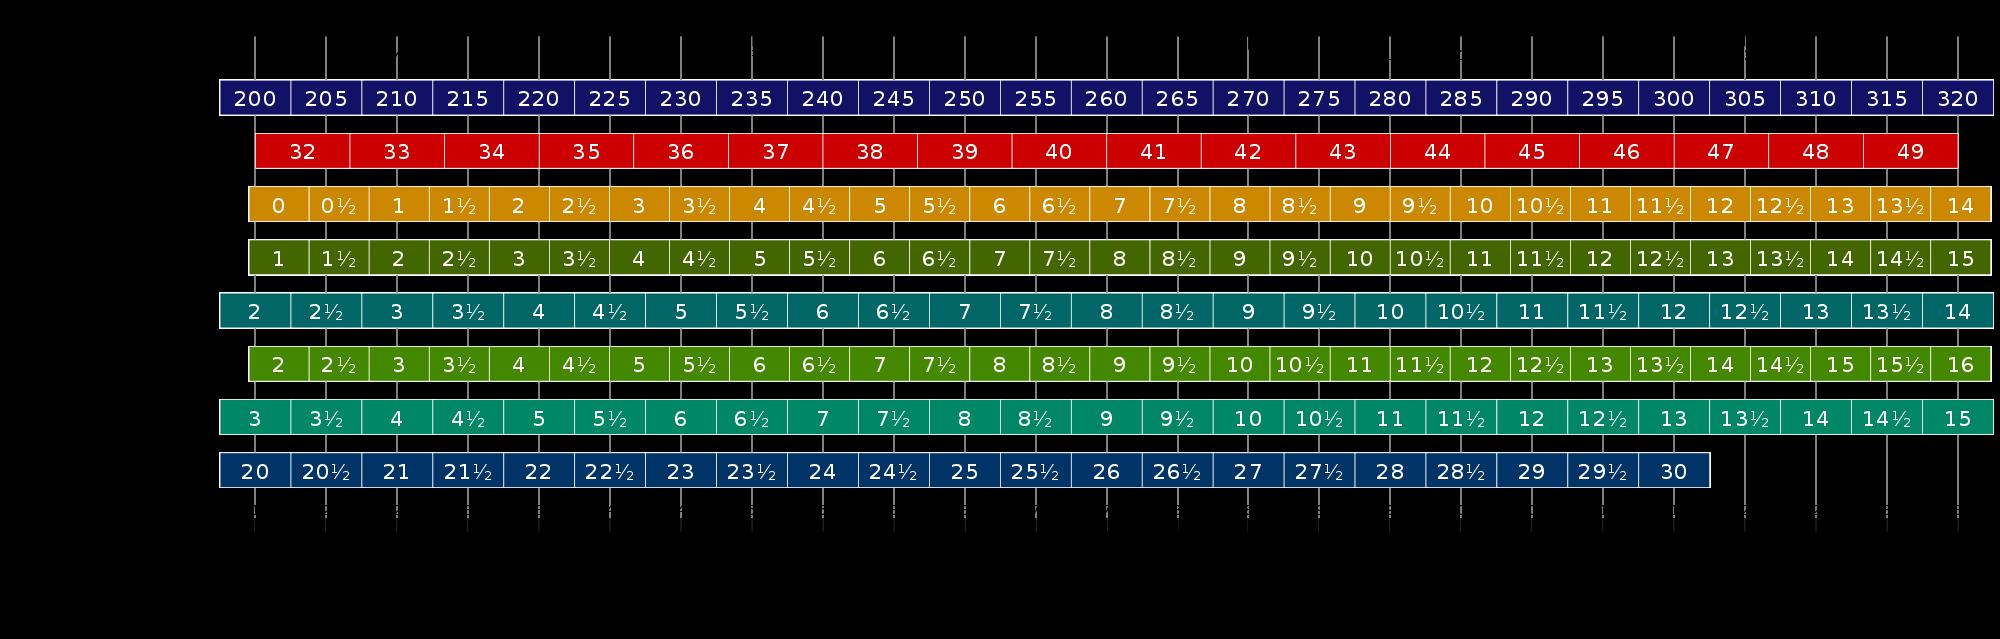 Universal Men S Shoe Size Chart International Shoe Sizes Shoe Size Chart Shoe Size Size Chart